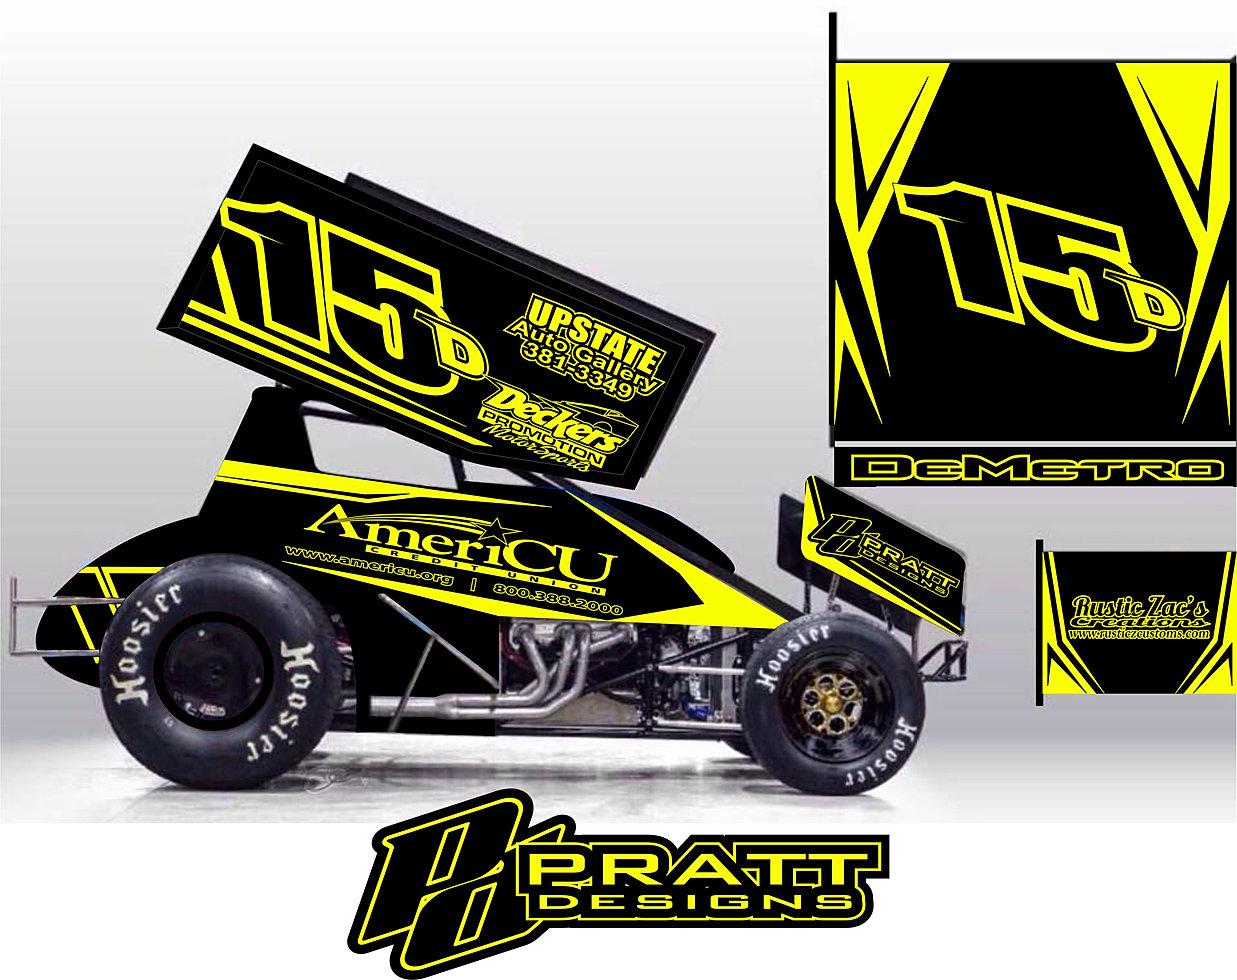 Pratt Designs